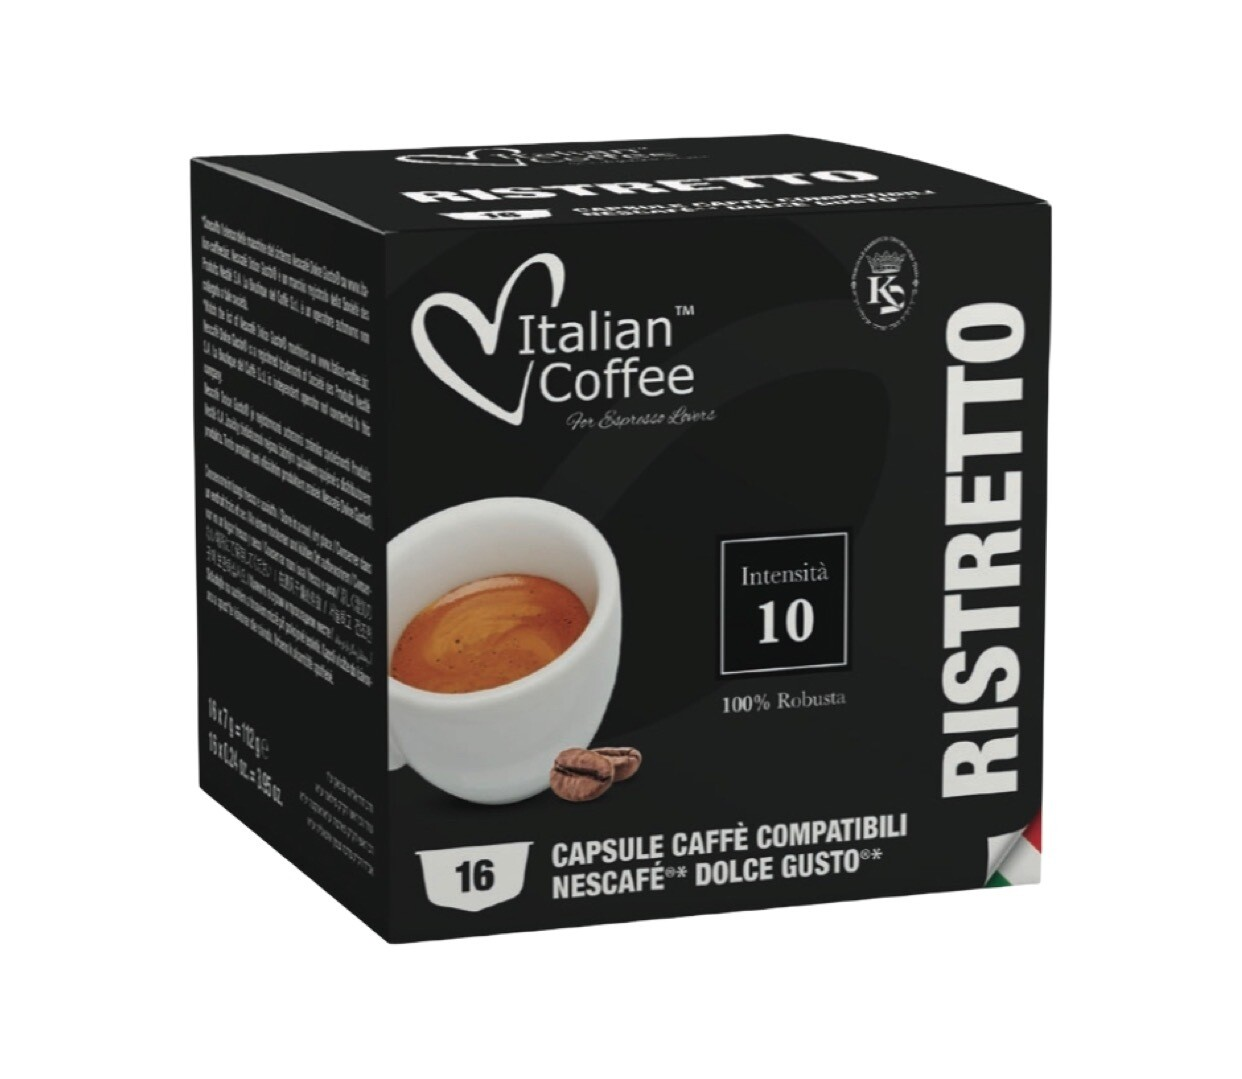 ItalianCoffee™️ Dolce Gusto Ristreto espresso x16 капсули